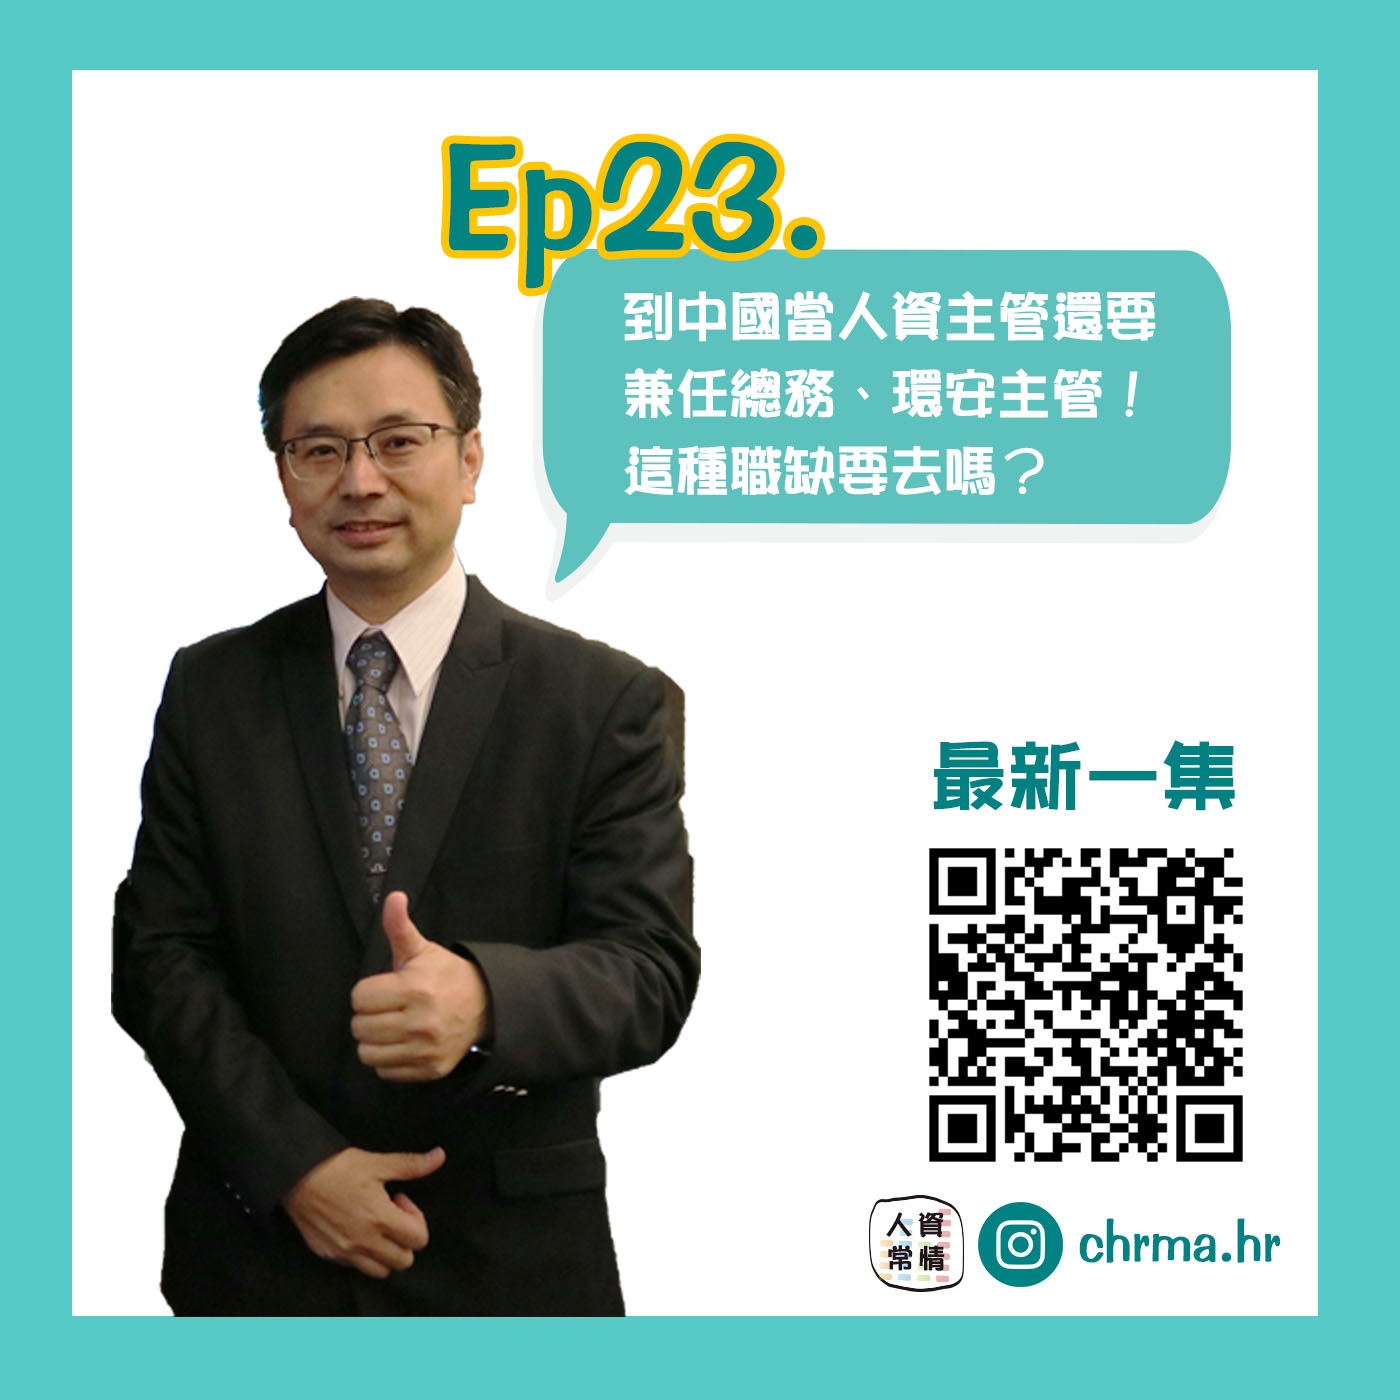 EP23|人資十分鐘 - 到中國當人資主管還要兼任總務、環安主管!這種職缺我要去嗎?feat.饒德民老師